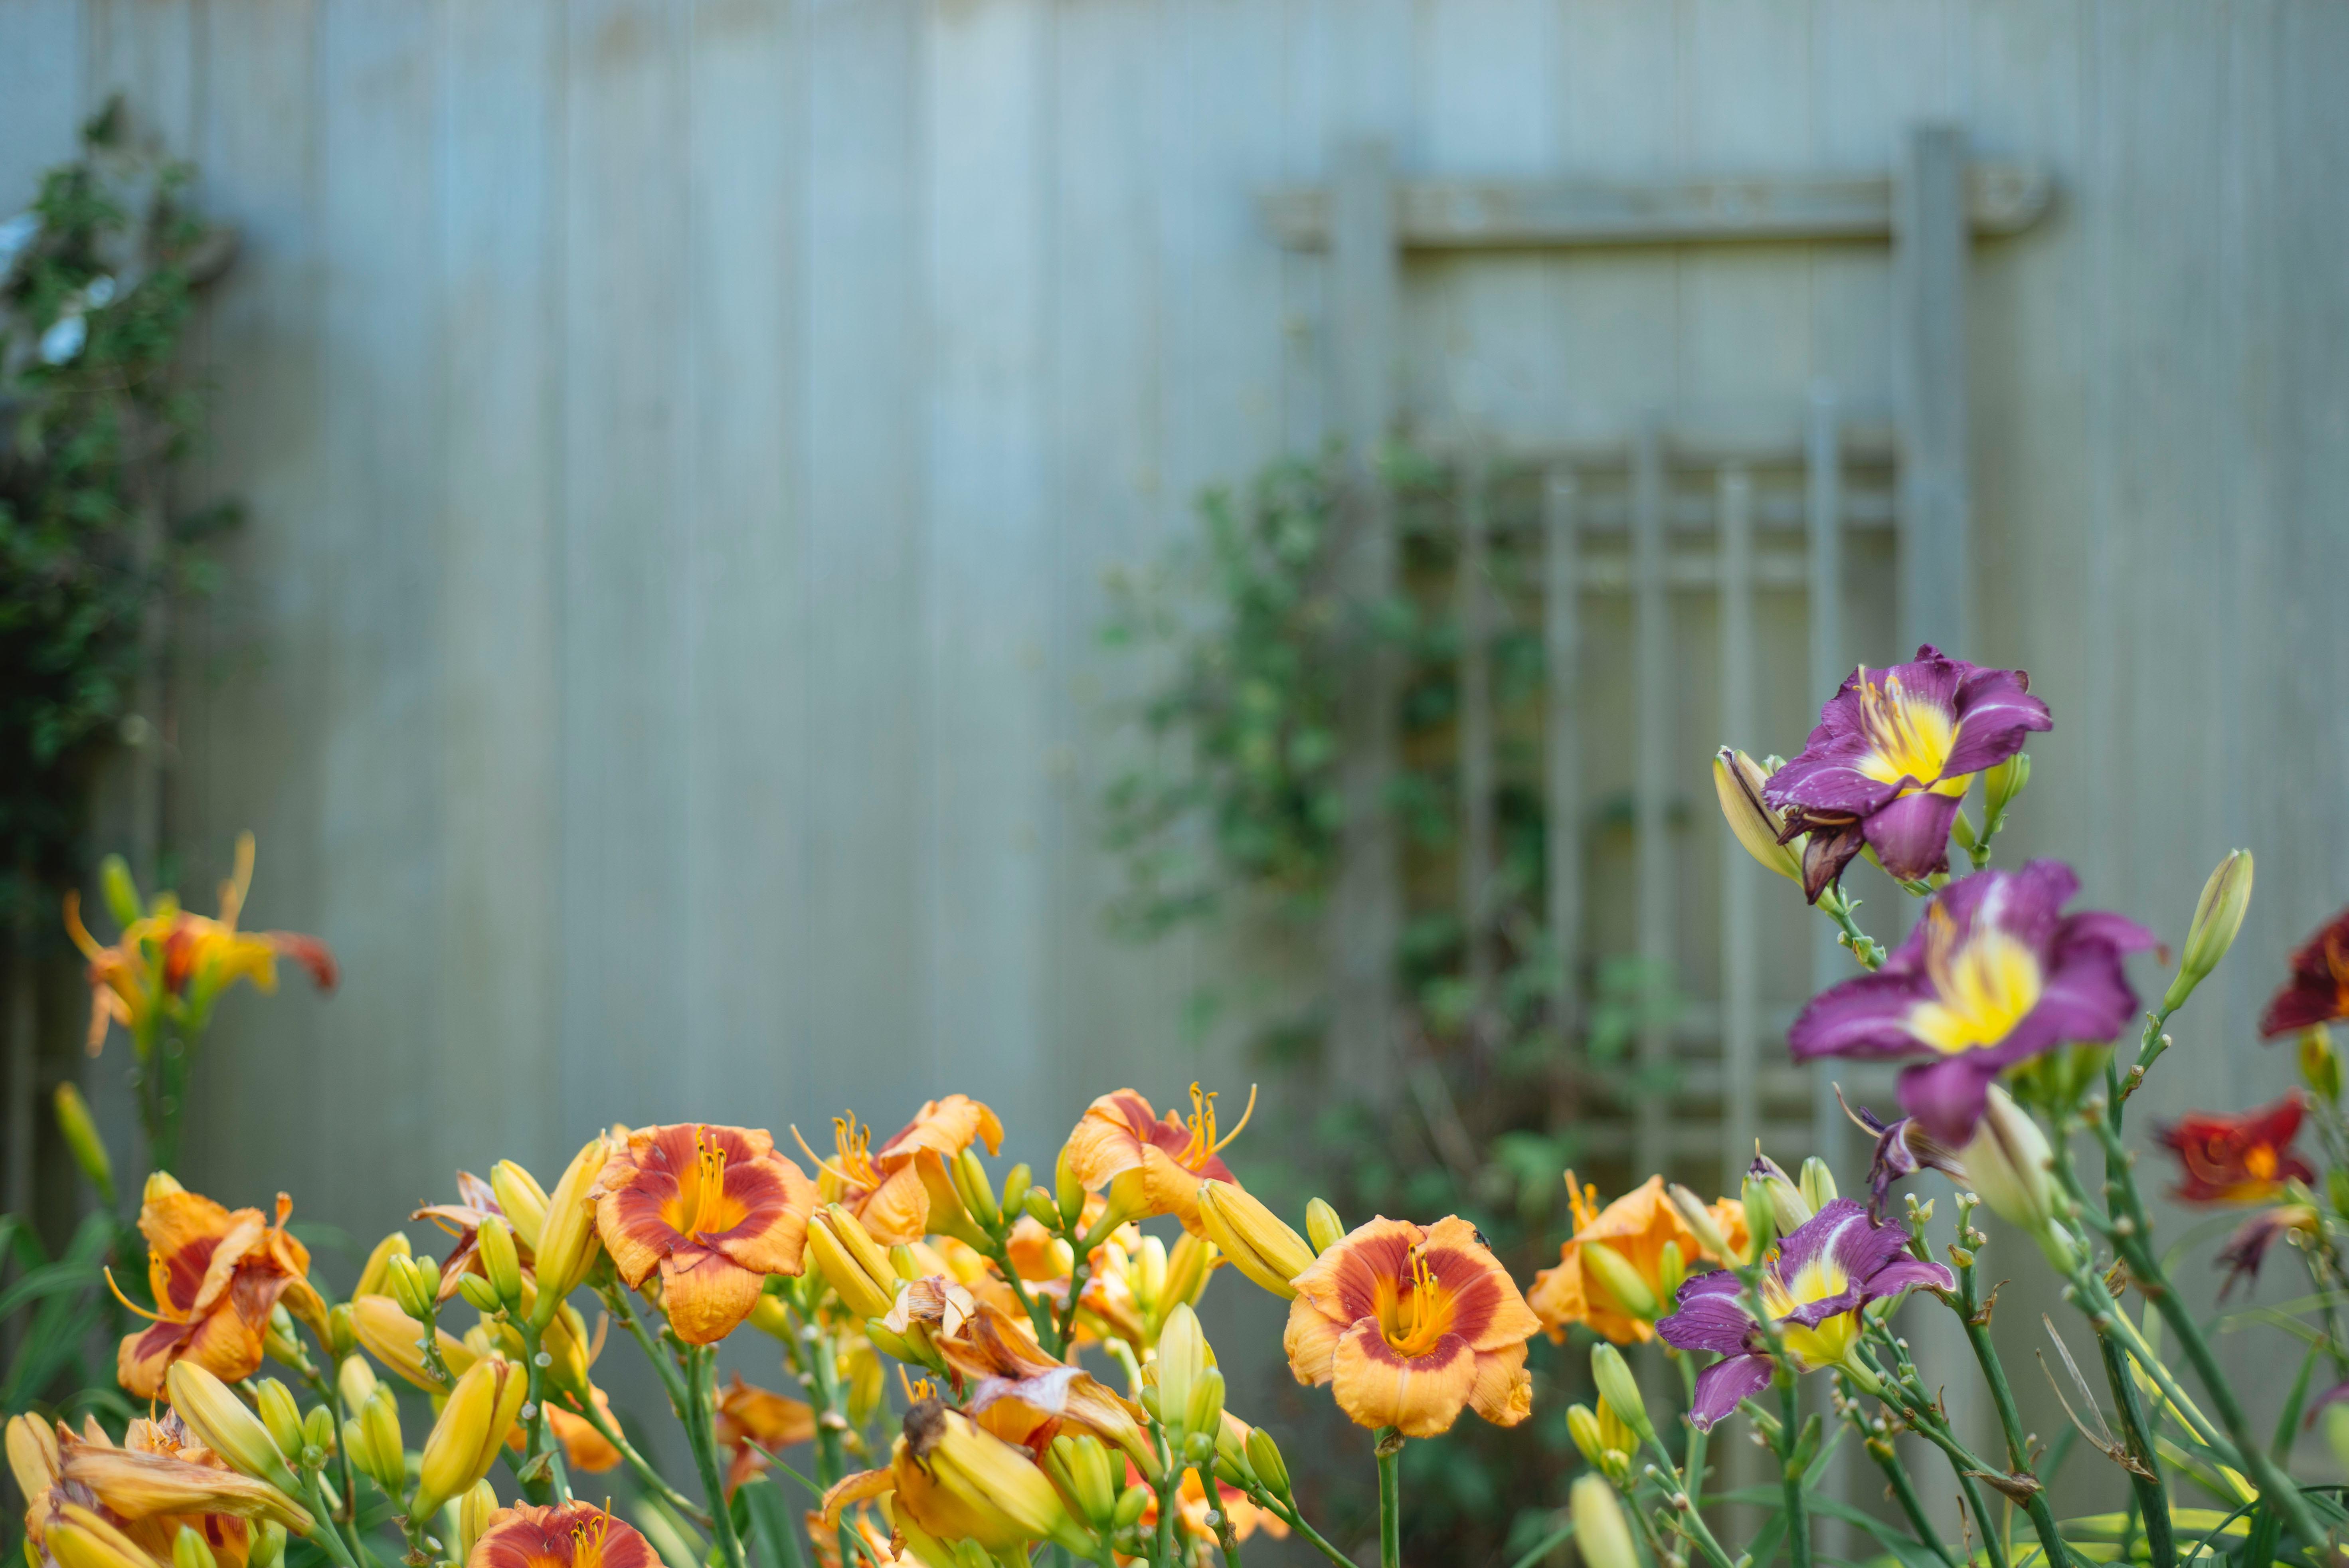 Beautiful Backyard flowers blooming outside